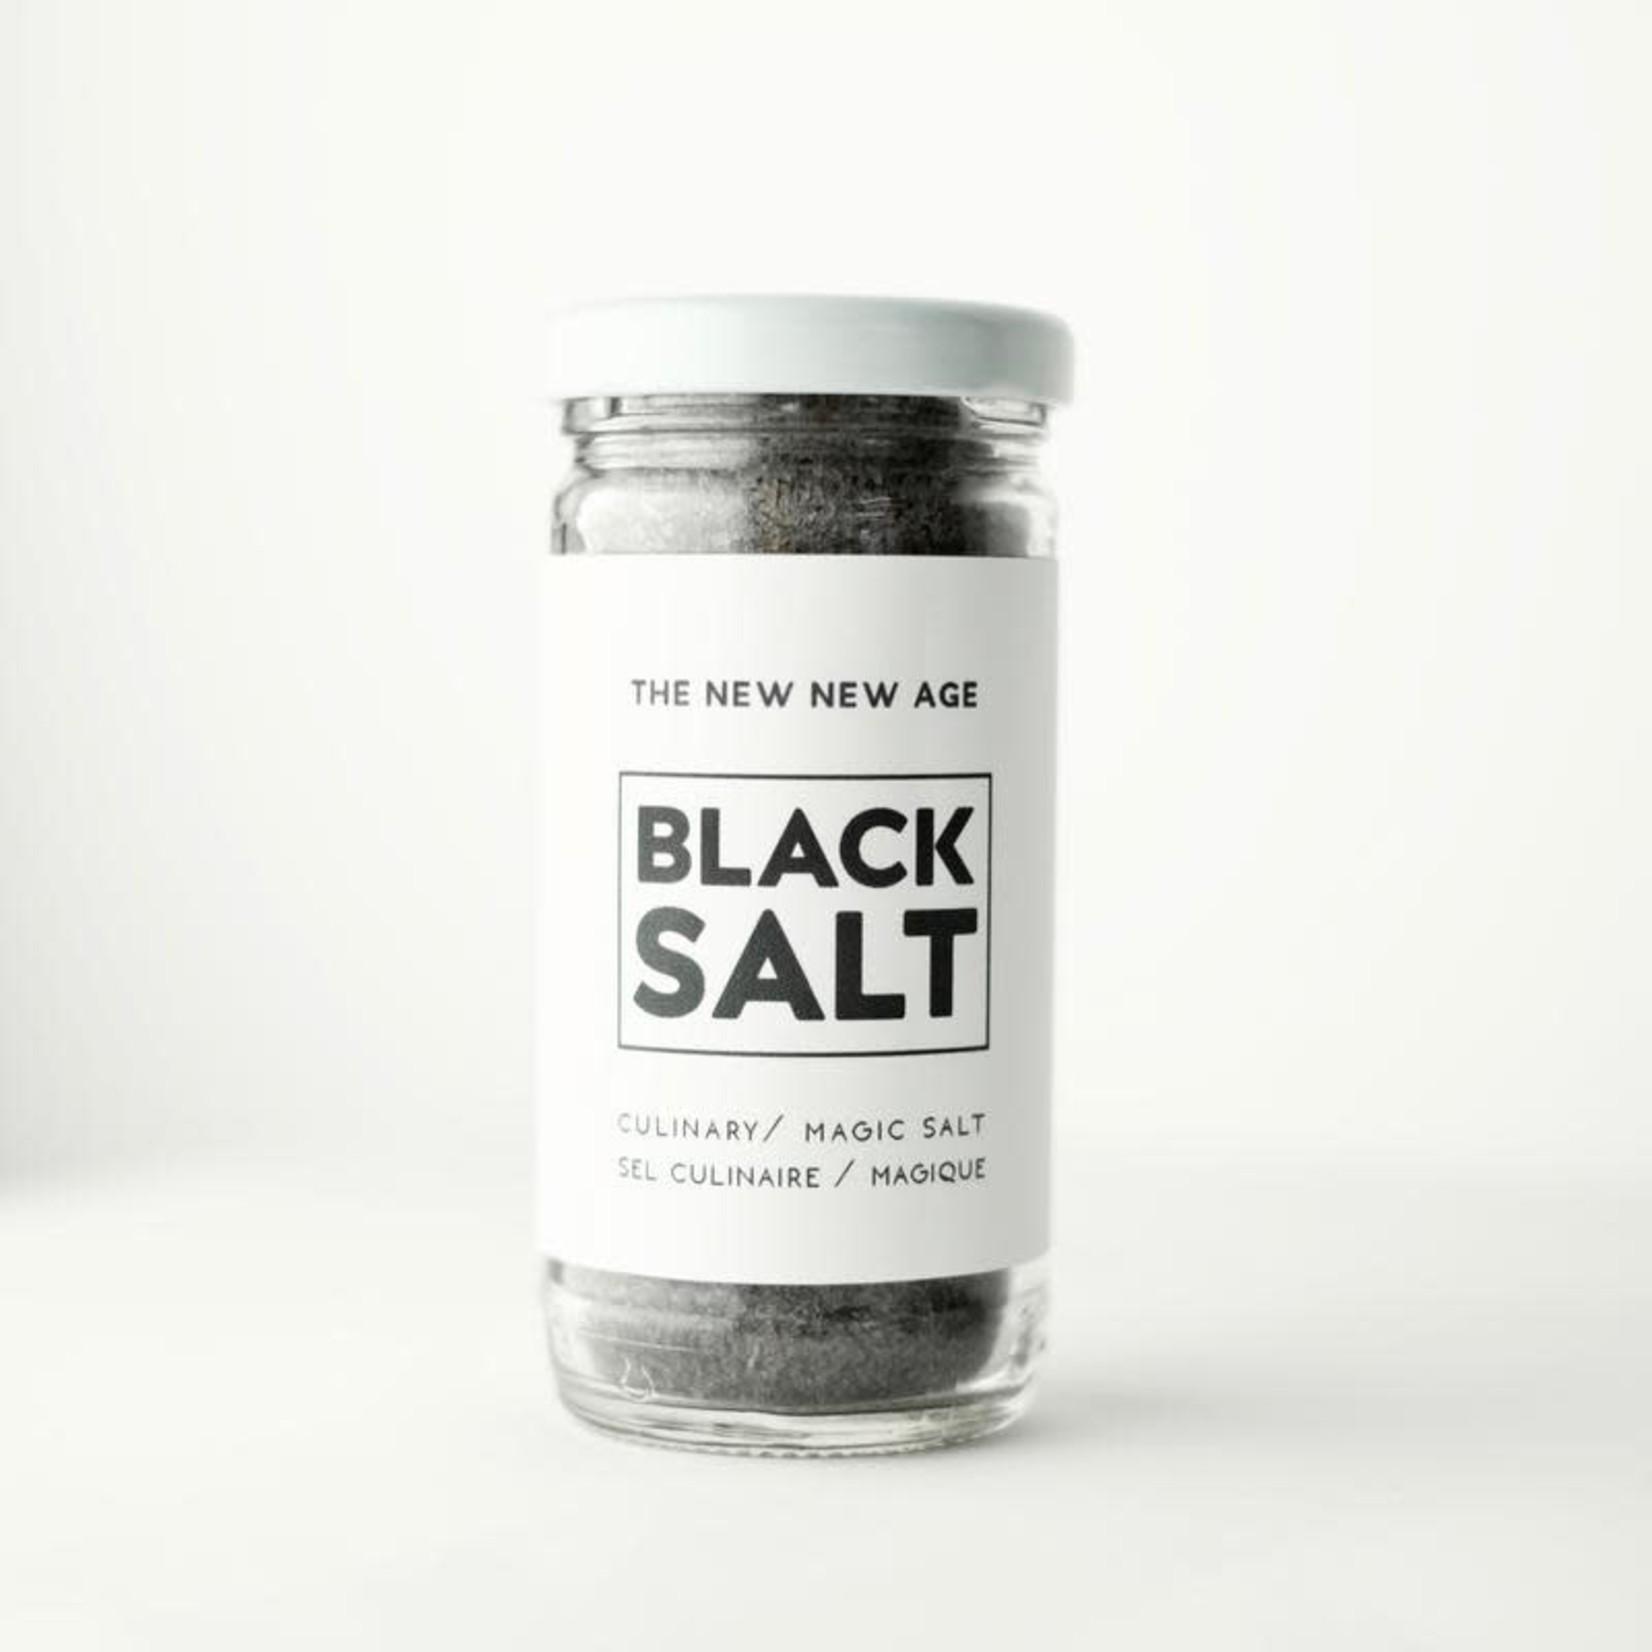 THE NEW NEW AGE BLACK SALT